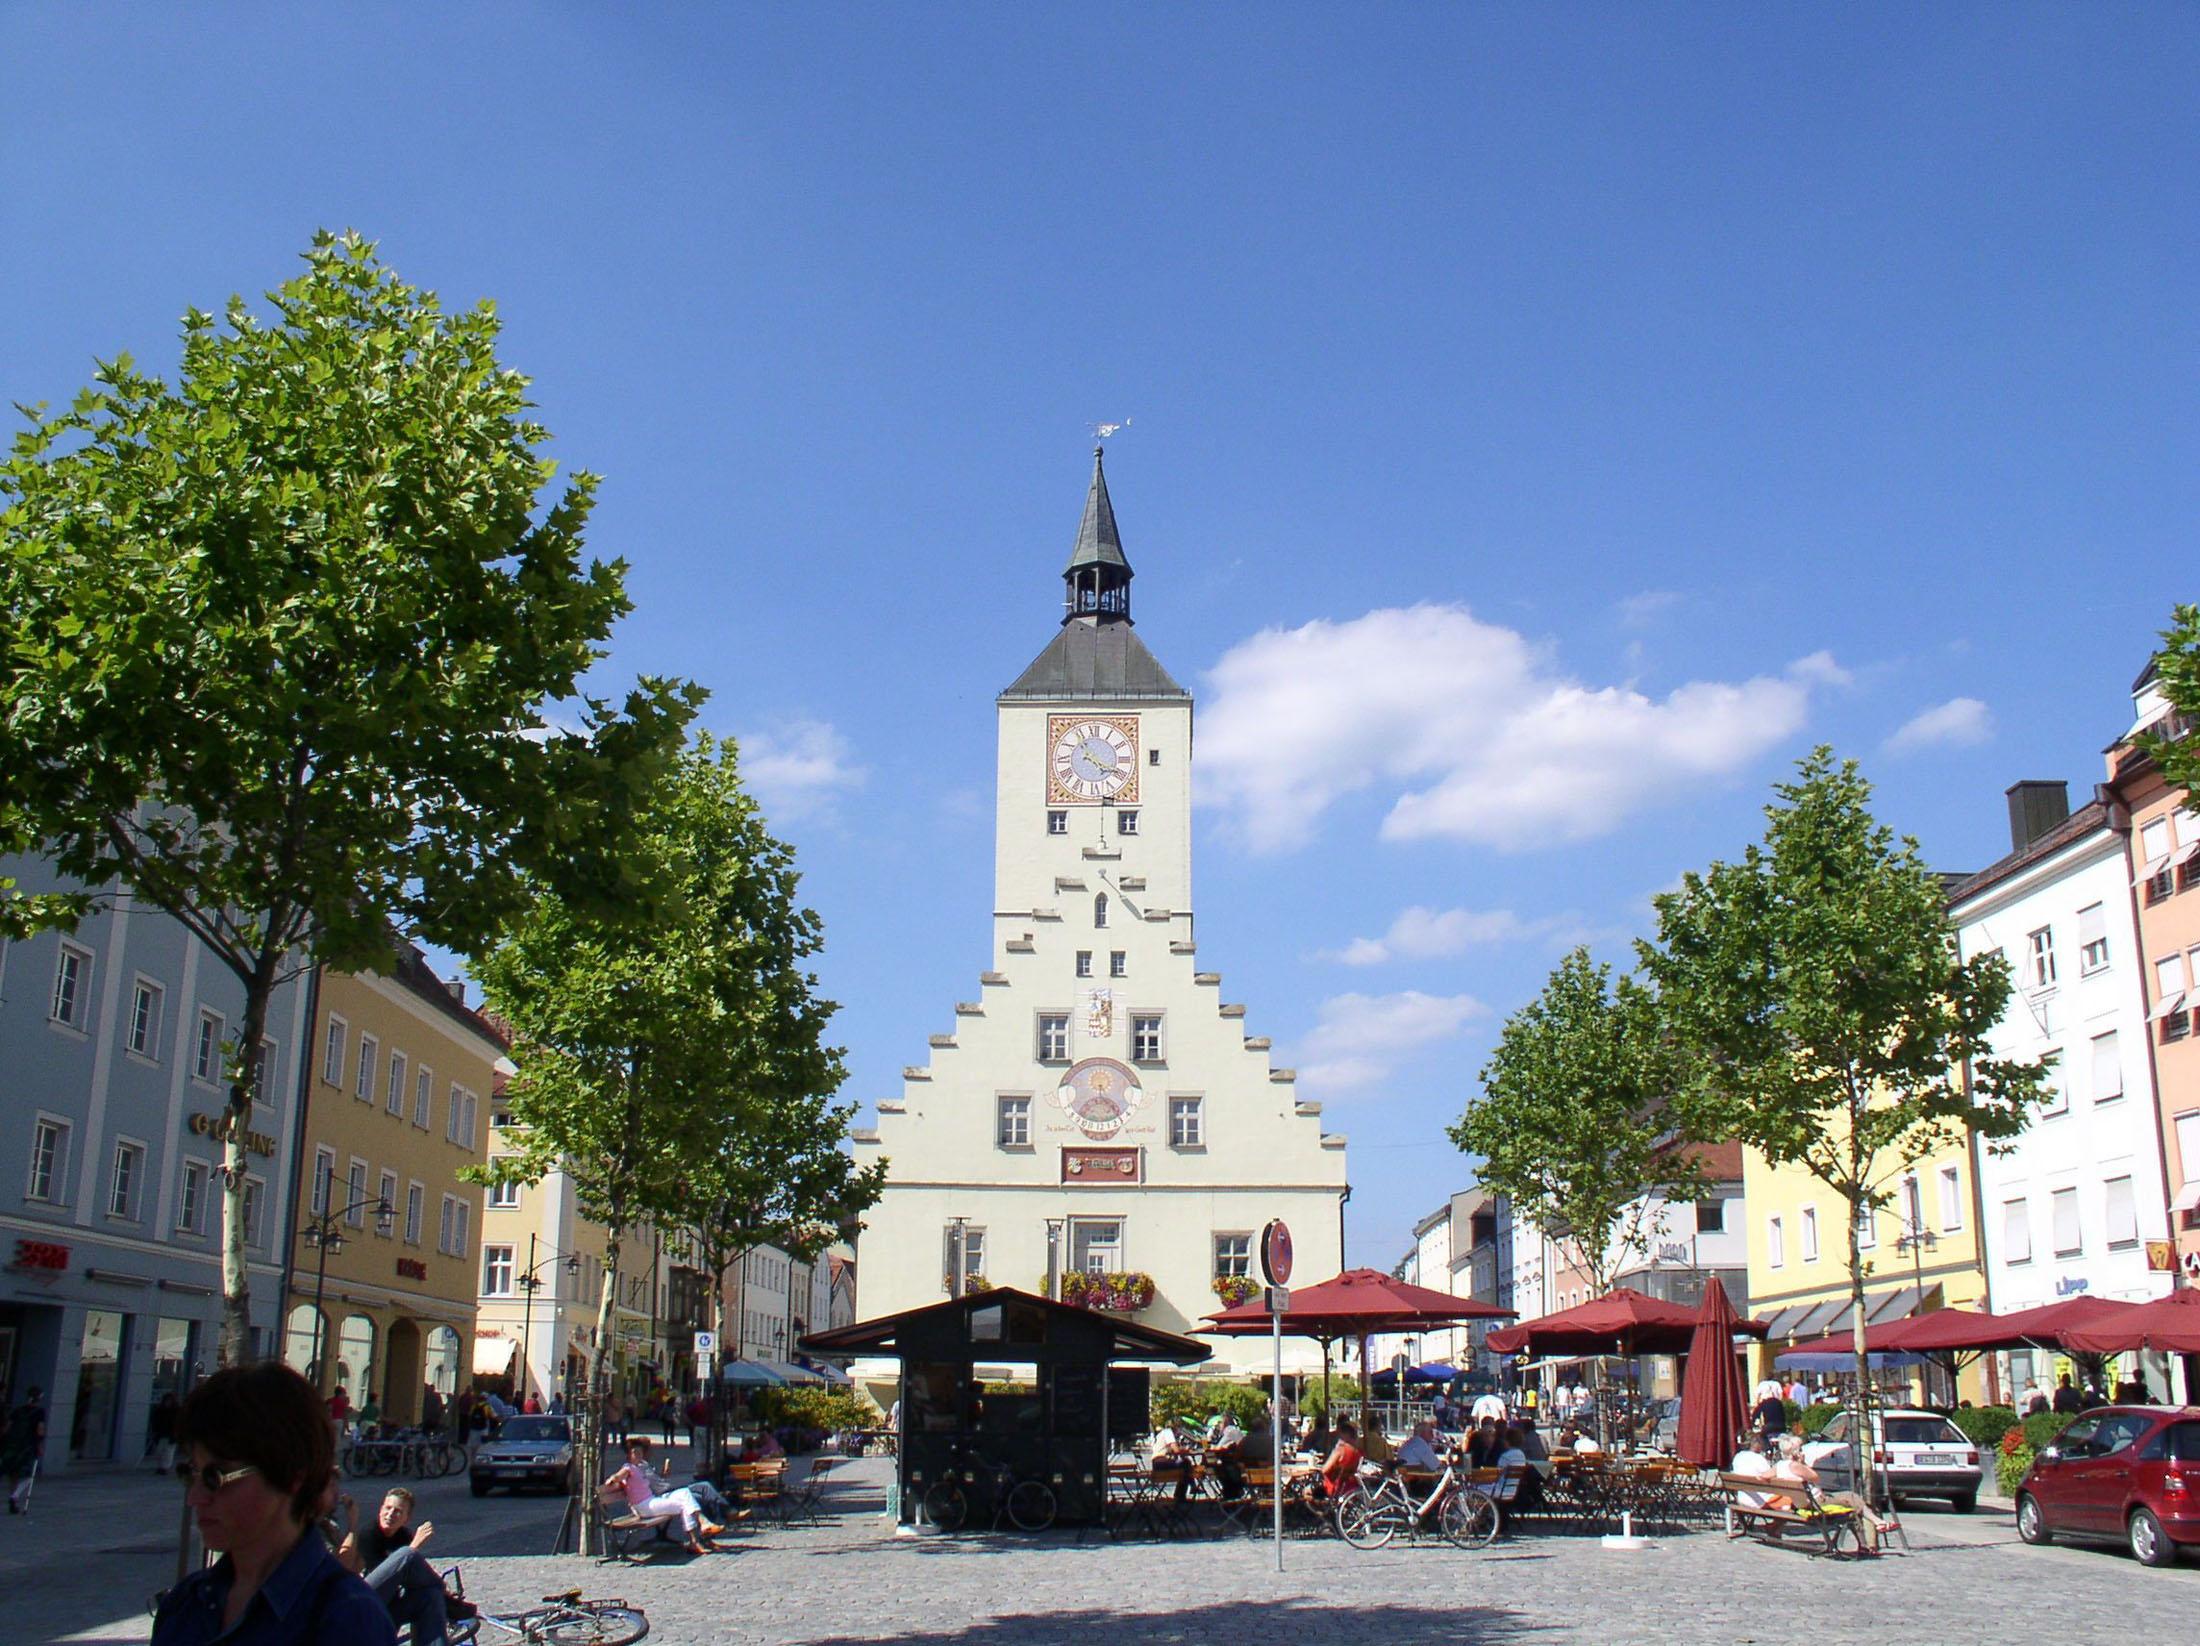 Town hall Deggendorf - Altes Rathaus in Deggendorf